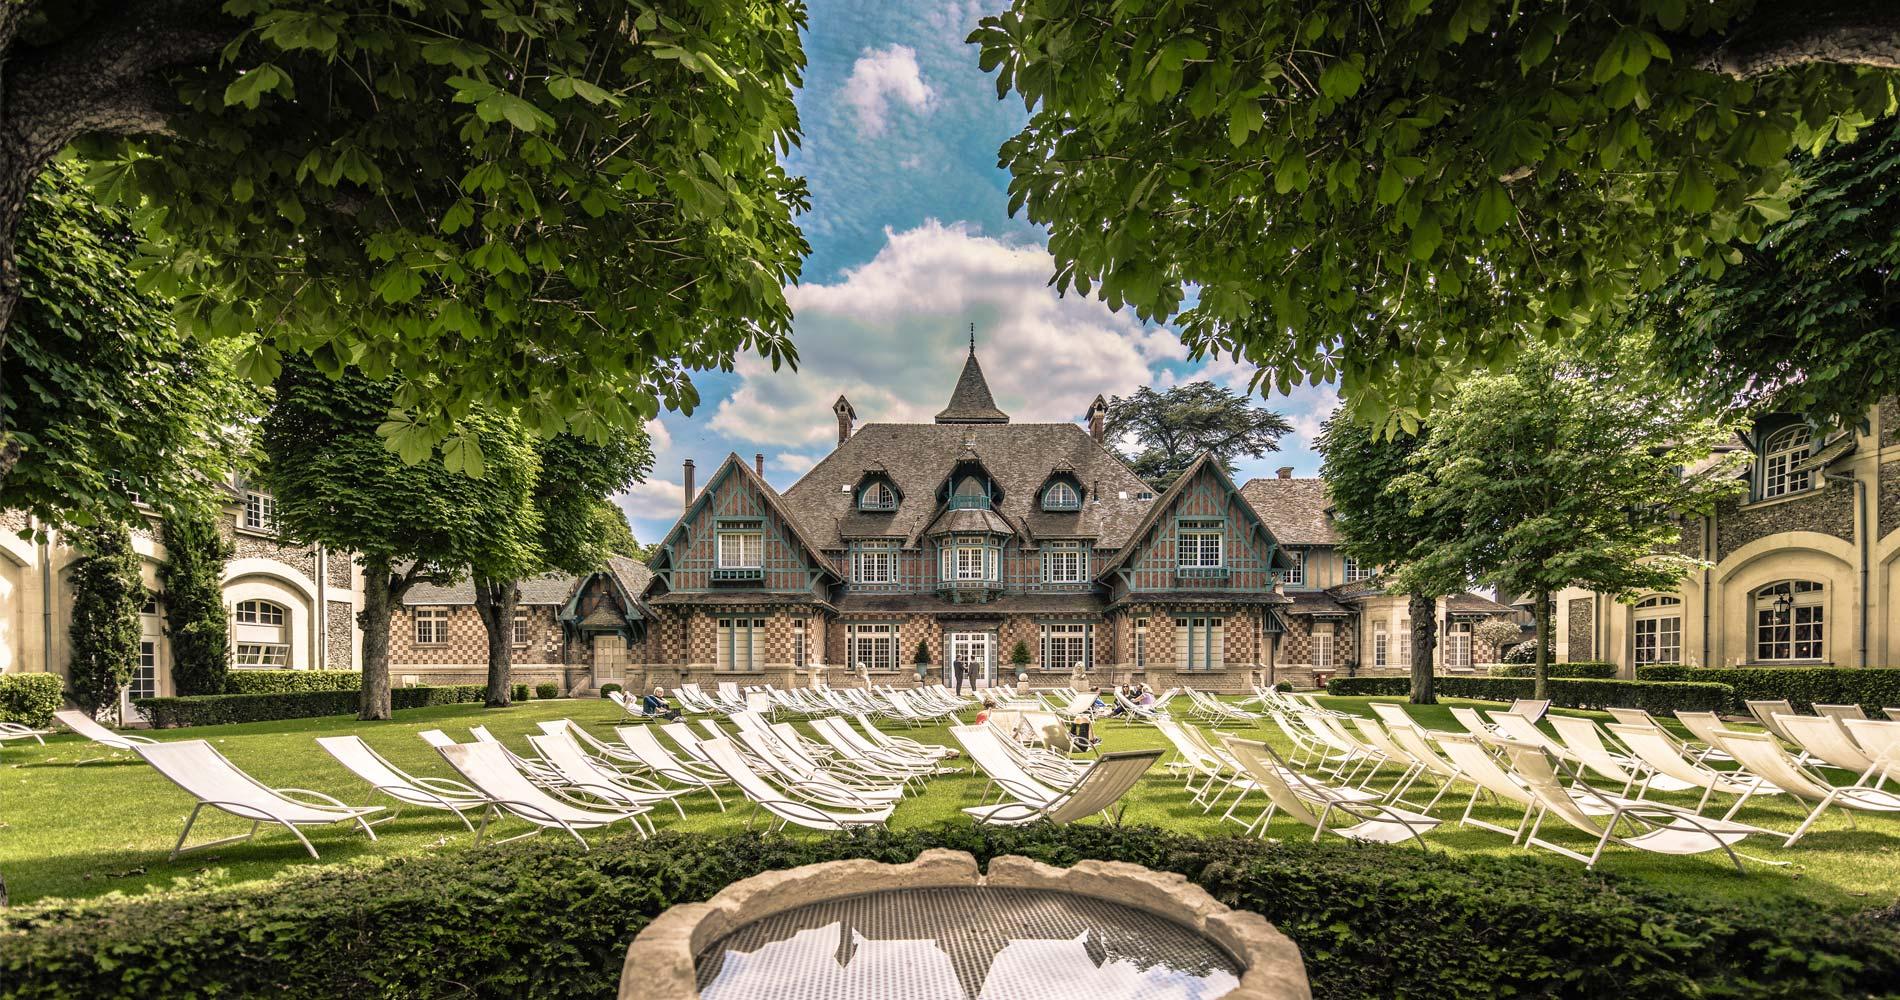 Hotel Hippodrome Saint Cloud